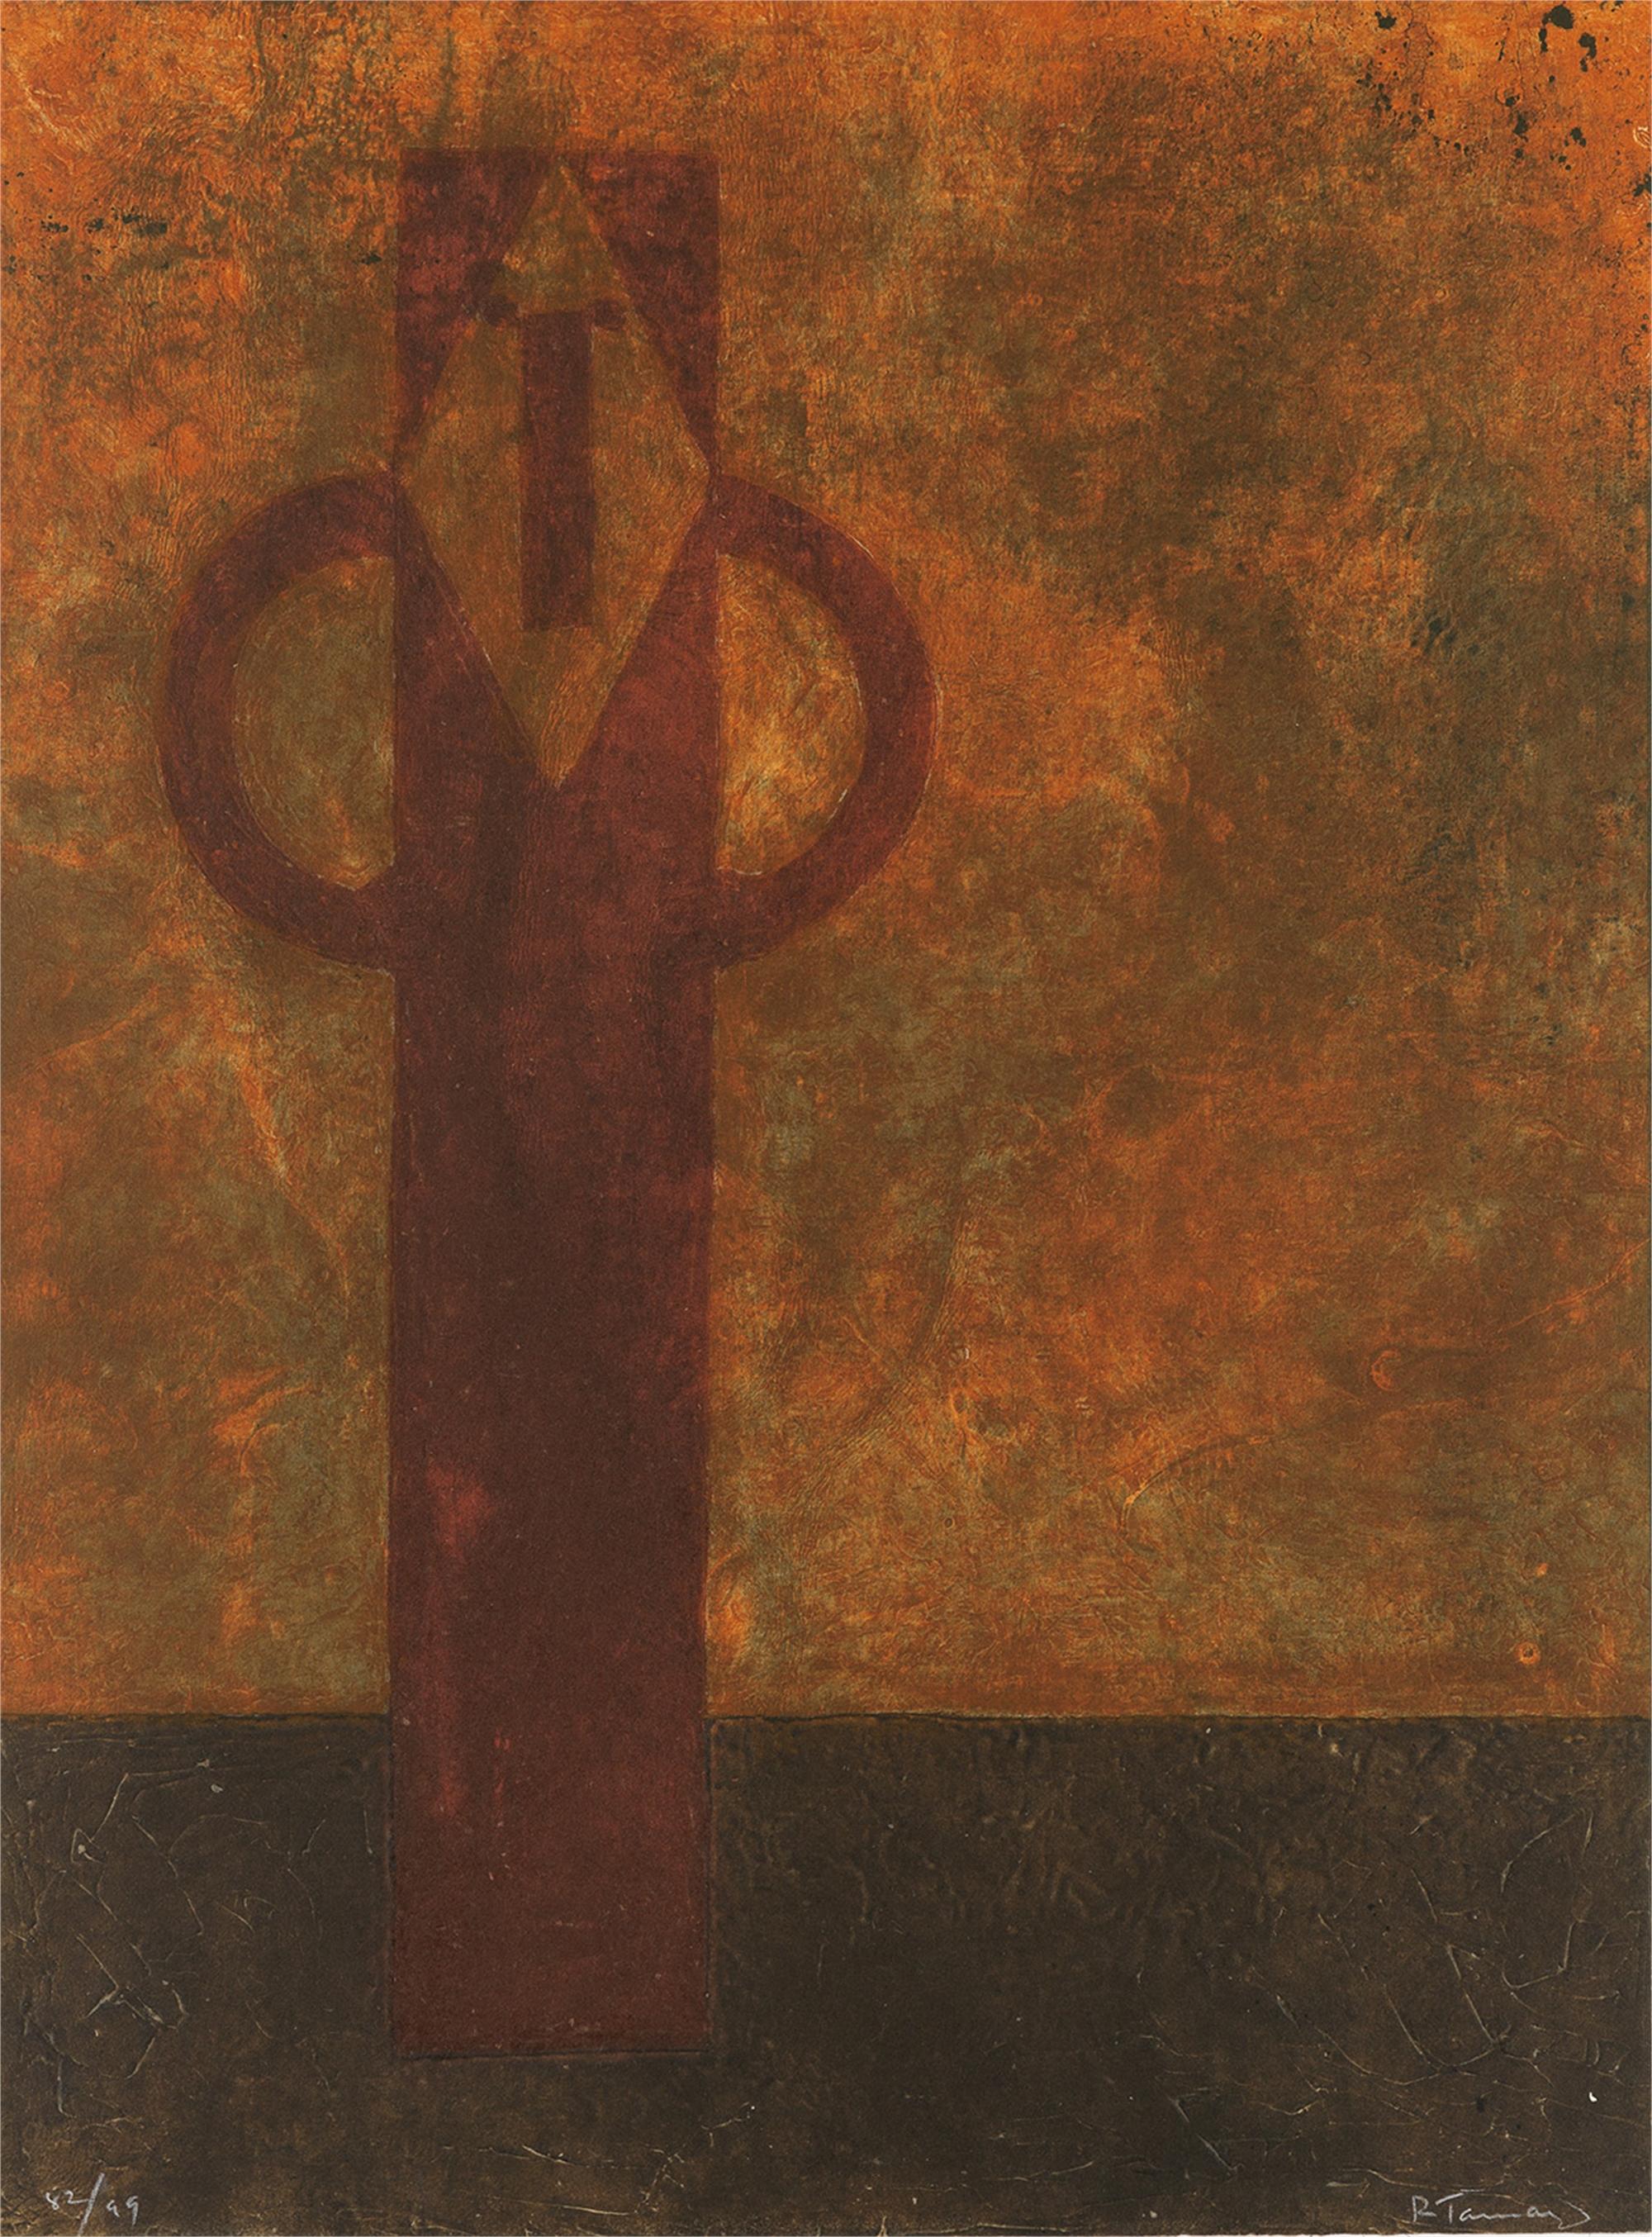 Figura Hierática by Rufino Tamayo (1899 - 1991)